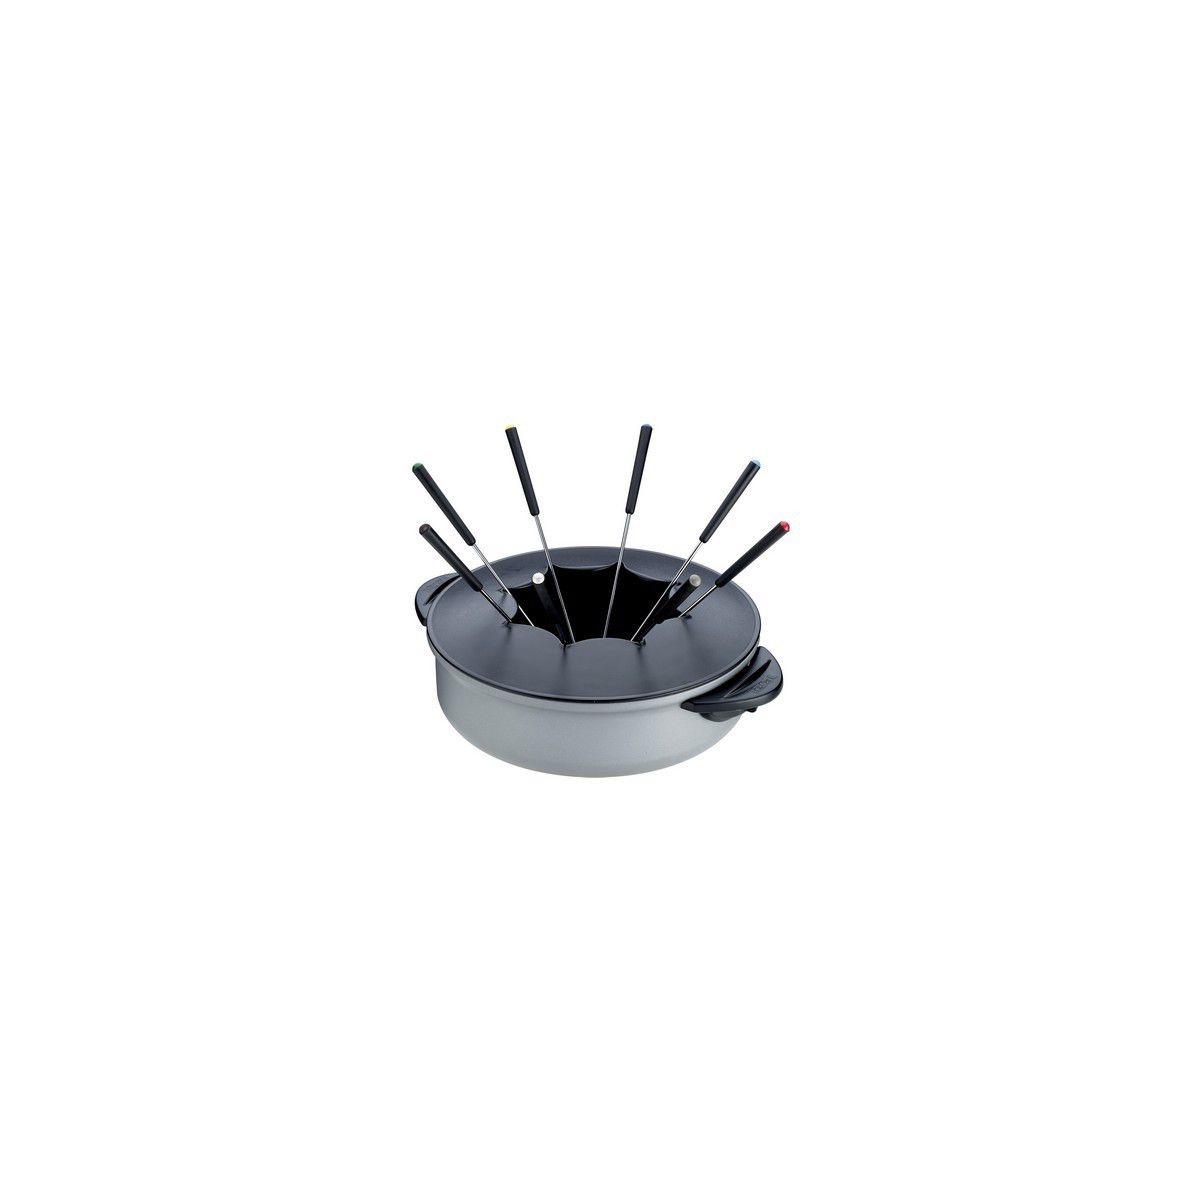 Wok et fondue tefal wk3020 13